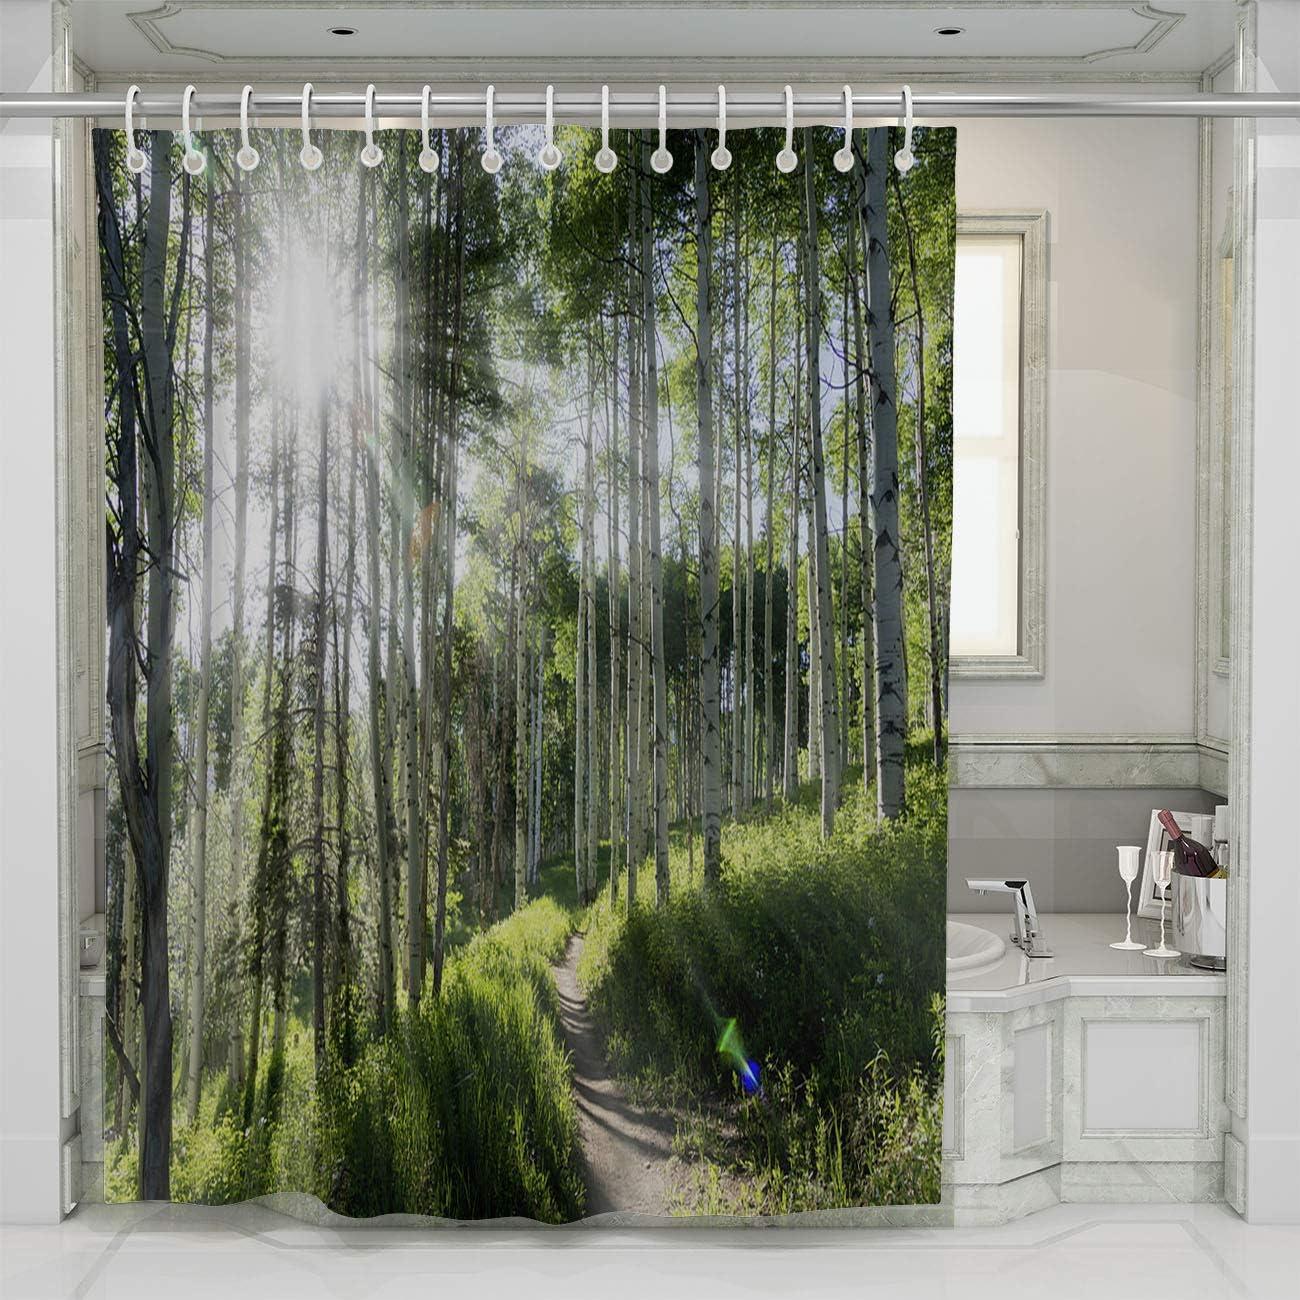 BEISISS Mountain Shower Curtain,Beautiful Mountain Hiking Trail Through Aspen Trees of Vail Colorado,Photo Art Fabric Bathroom Decor Set with Hooks